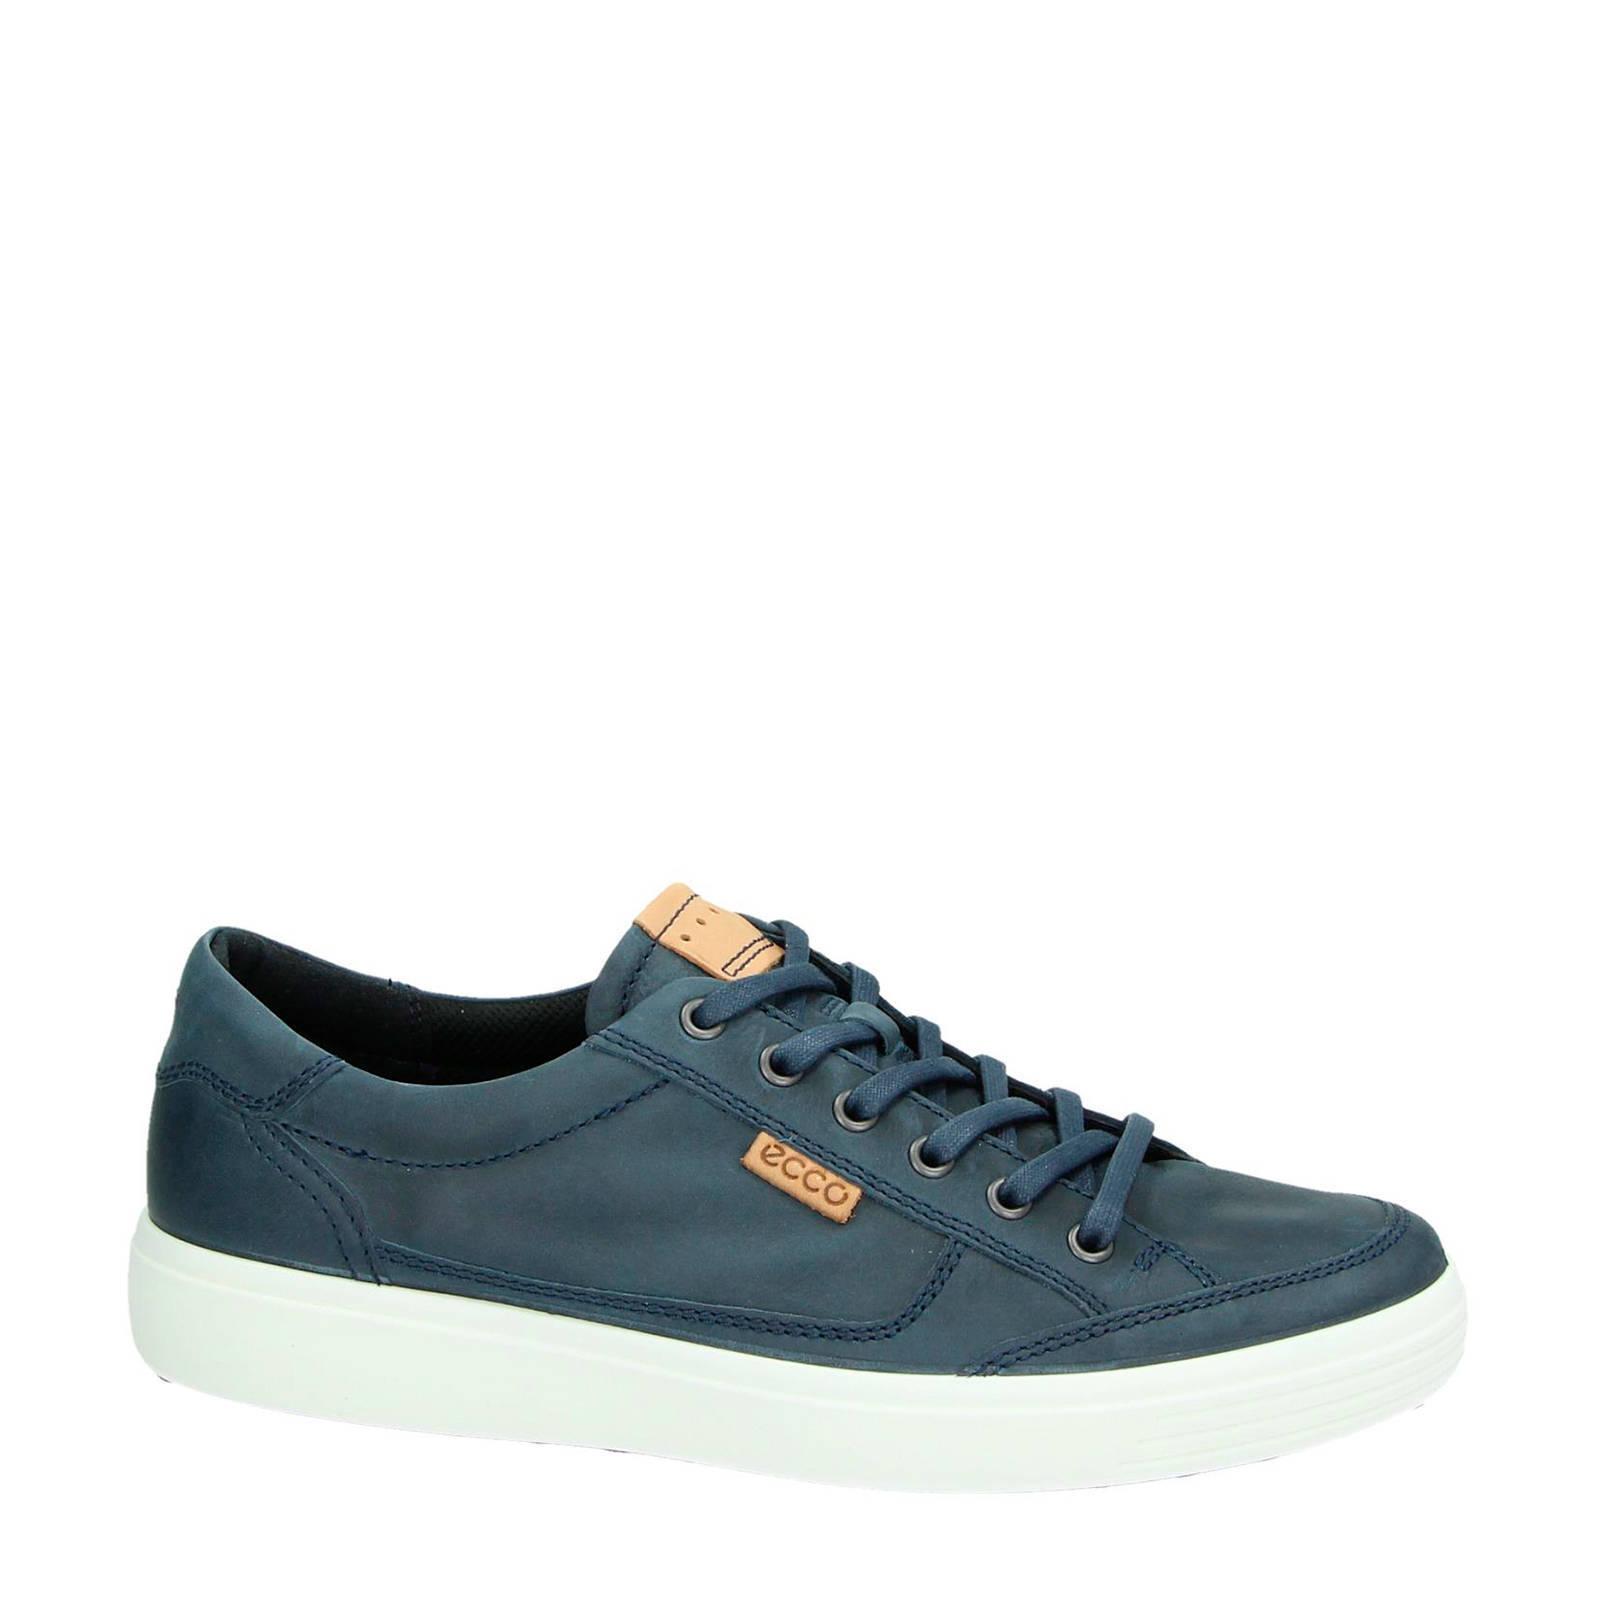 Ecco nubuck sneakers Soft 7 blauw | wehkamp